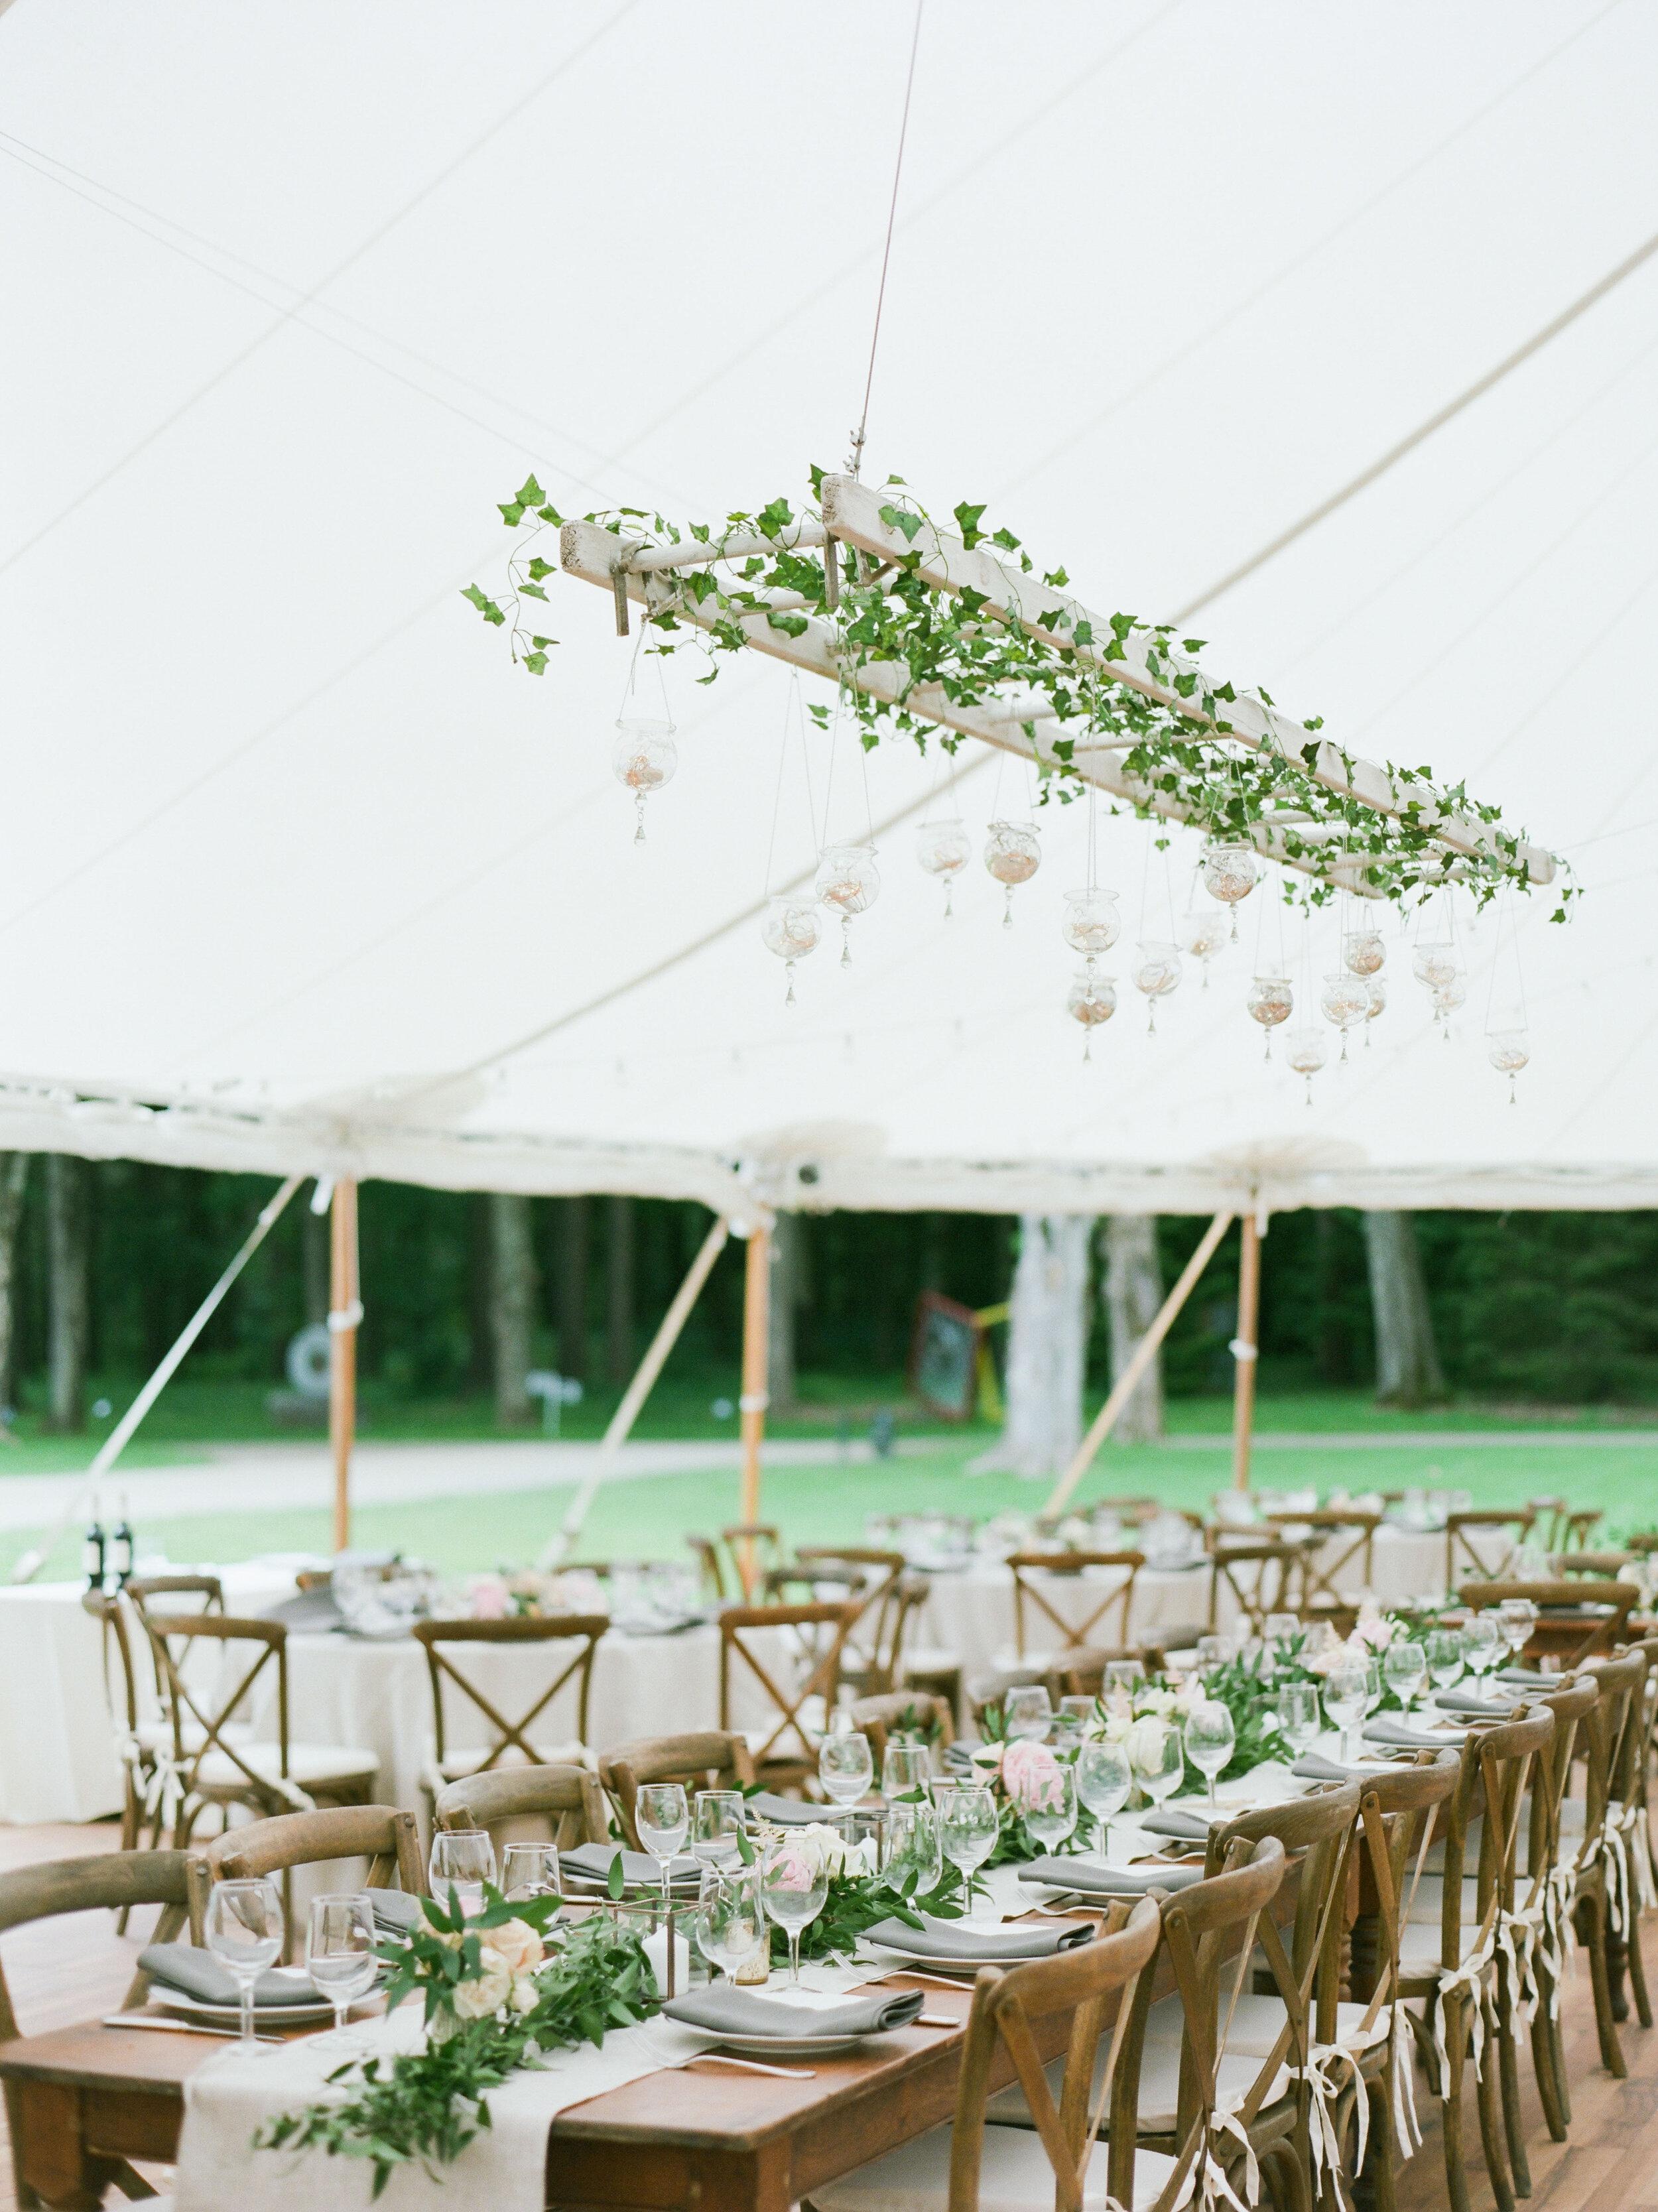 Estate Weddings in Western MA